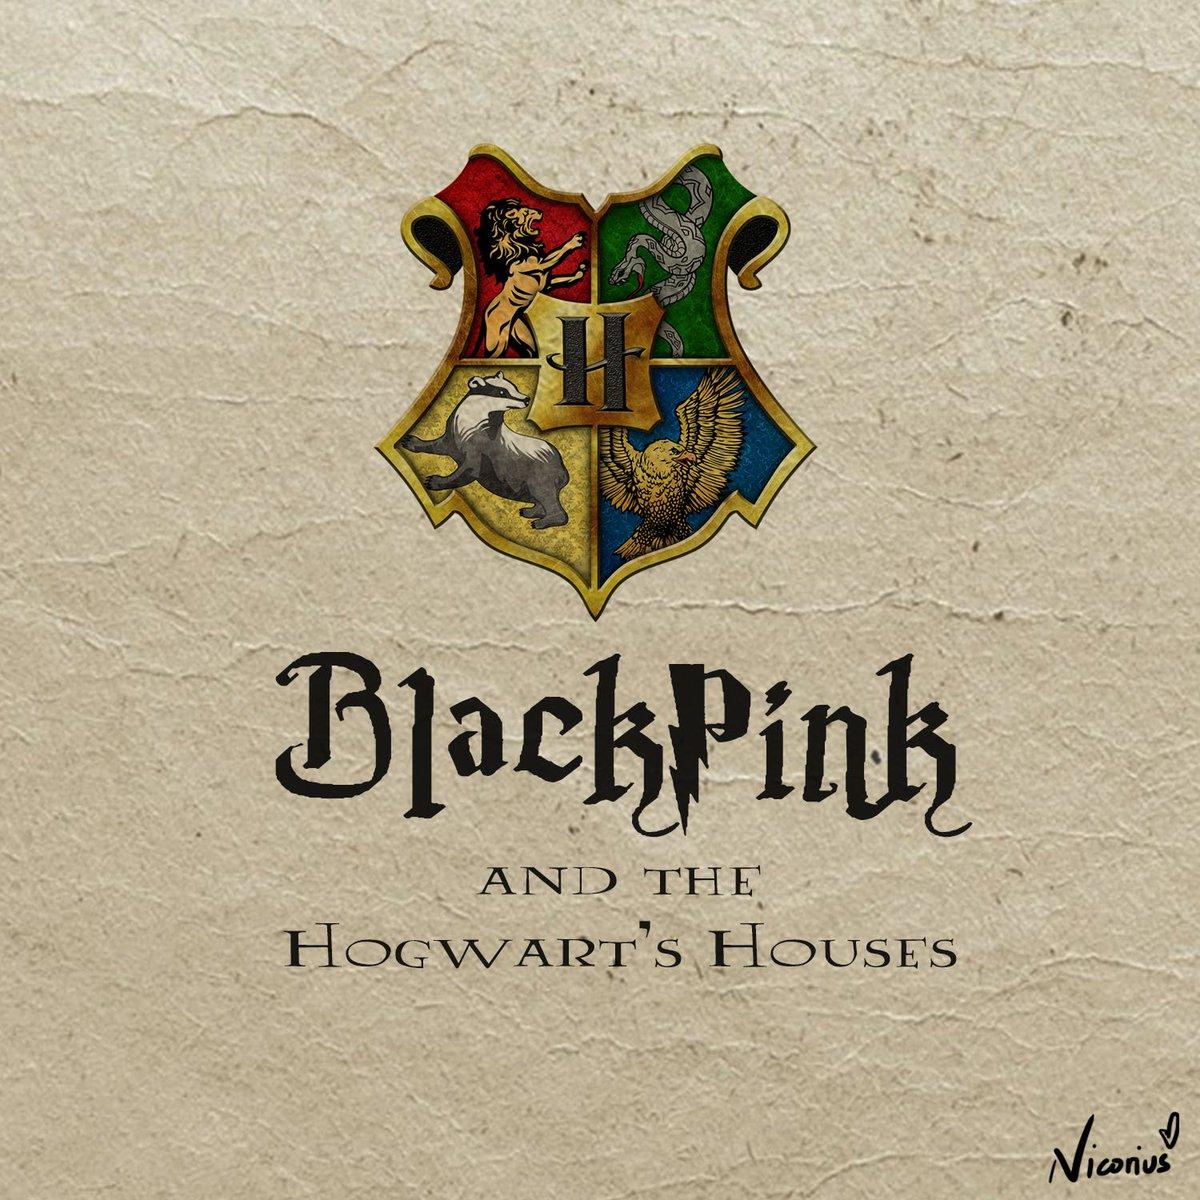 """If I'm the sorting hat"" 😊 @ygofficialblink  #BLACKPINK #blackpinkfanart #LISA #ROSÉ #JENNIE #JISOO"